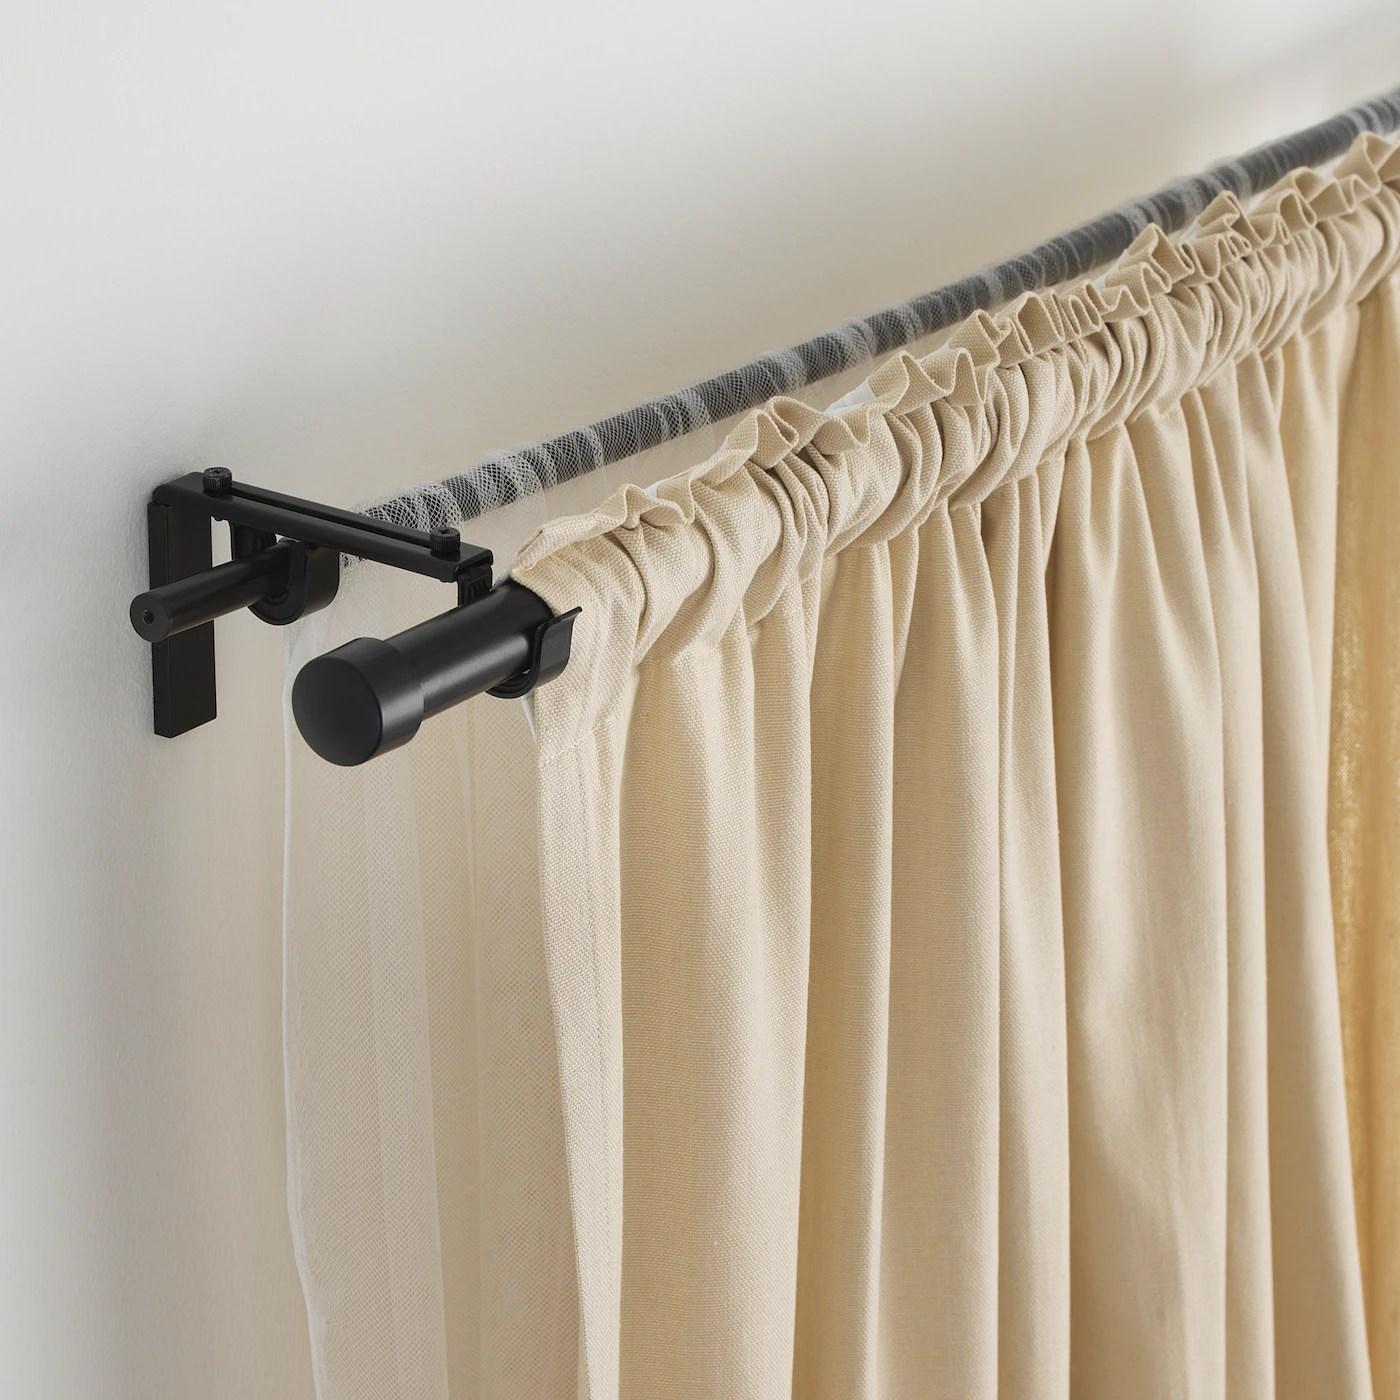 hugad curtain rod black 210 385 cm